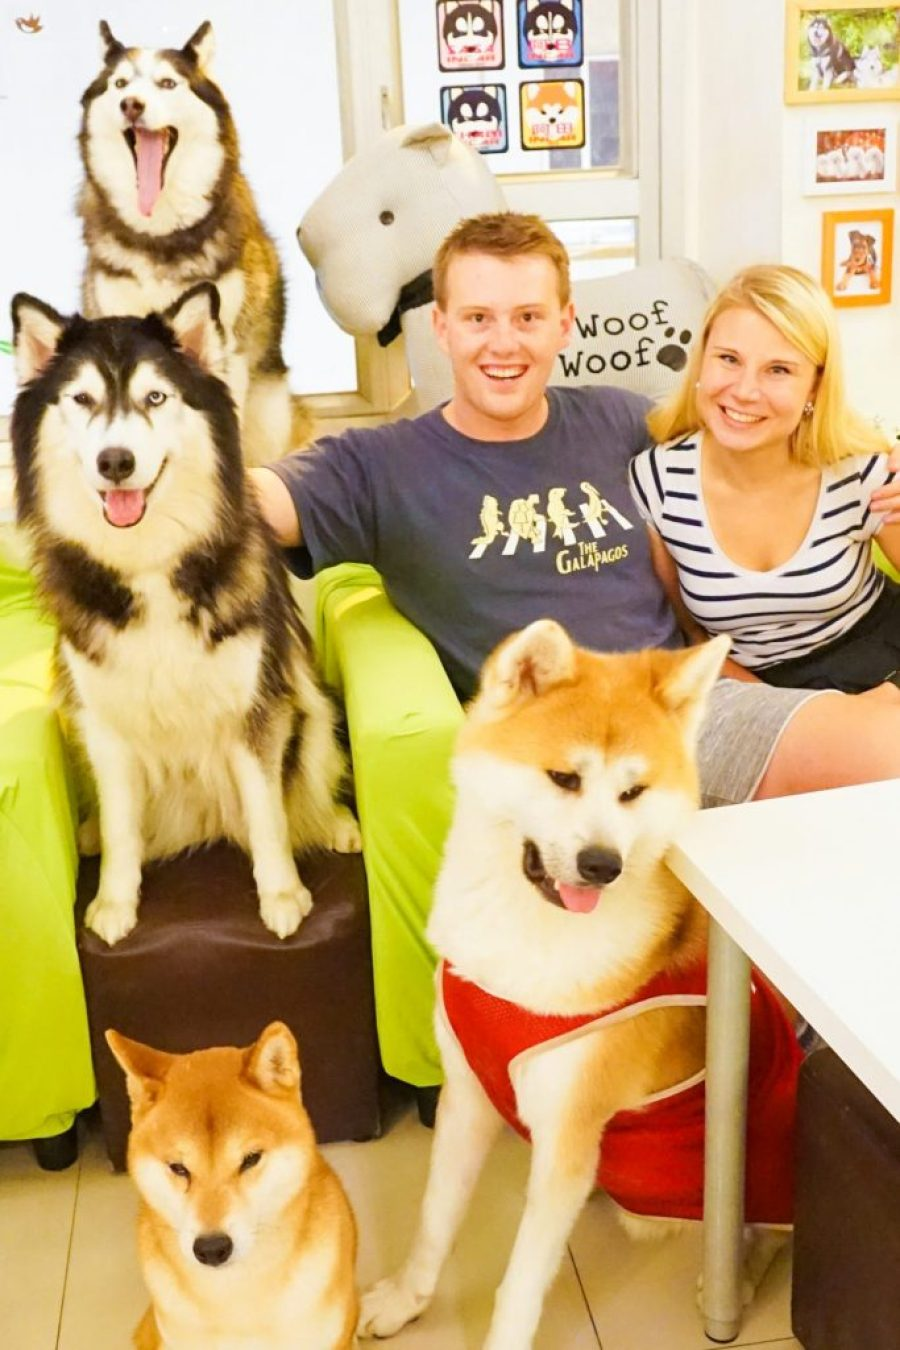 Cute Dogs in Hong Kong Dog Cafe